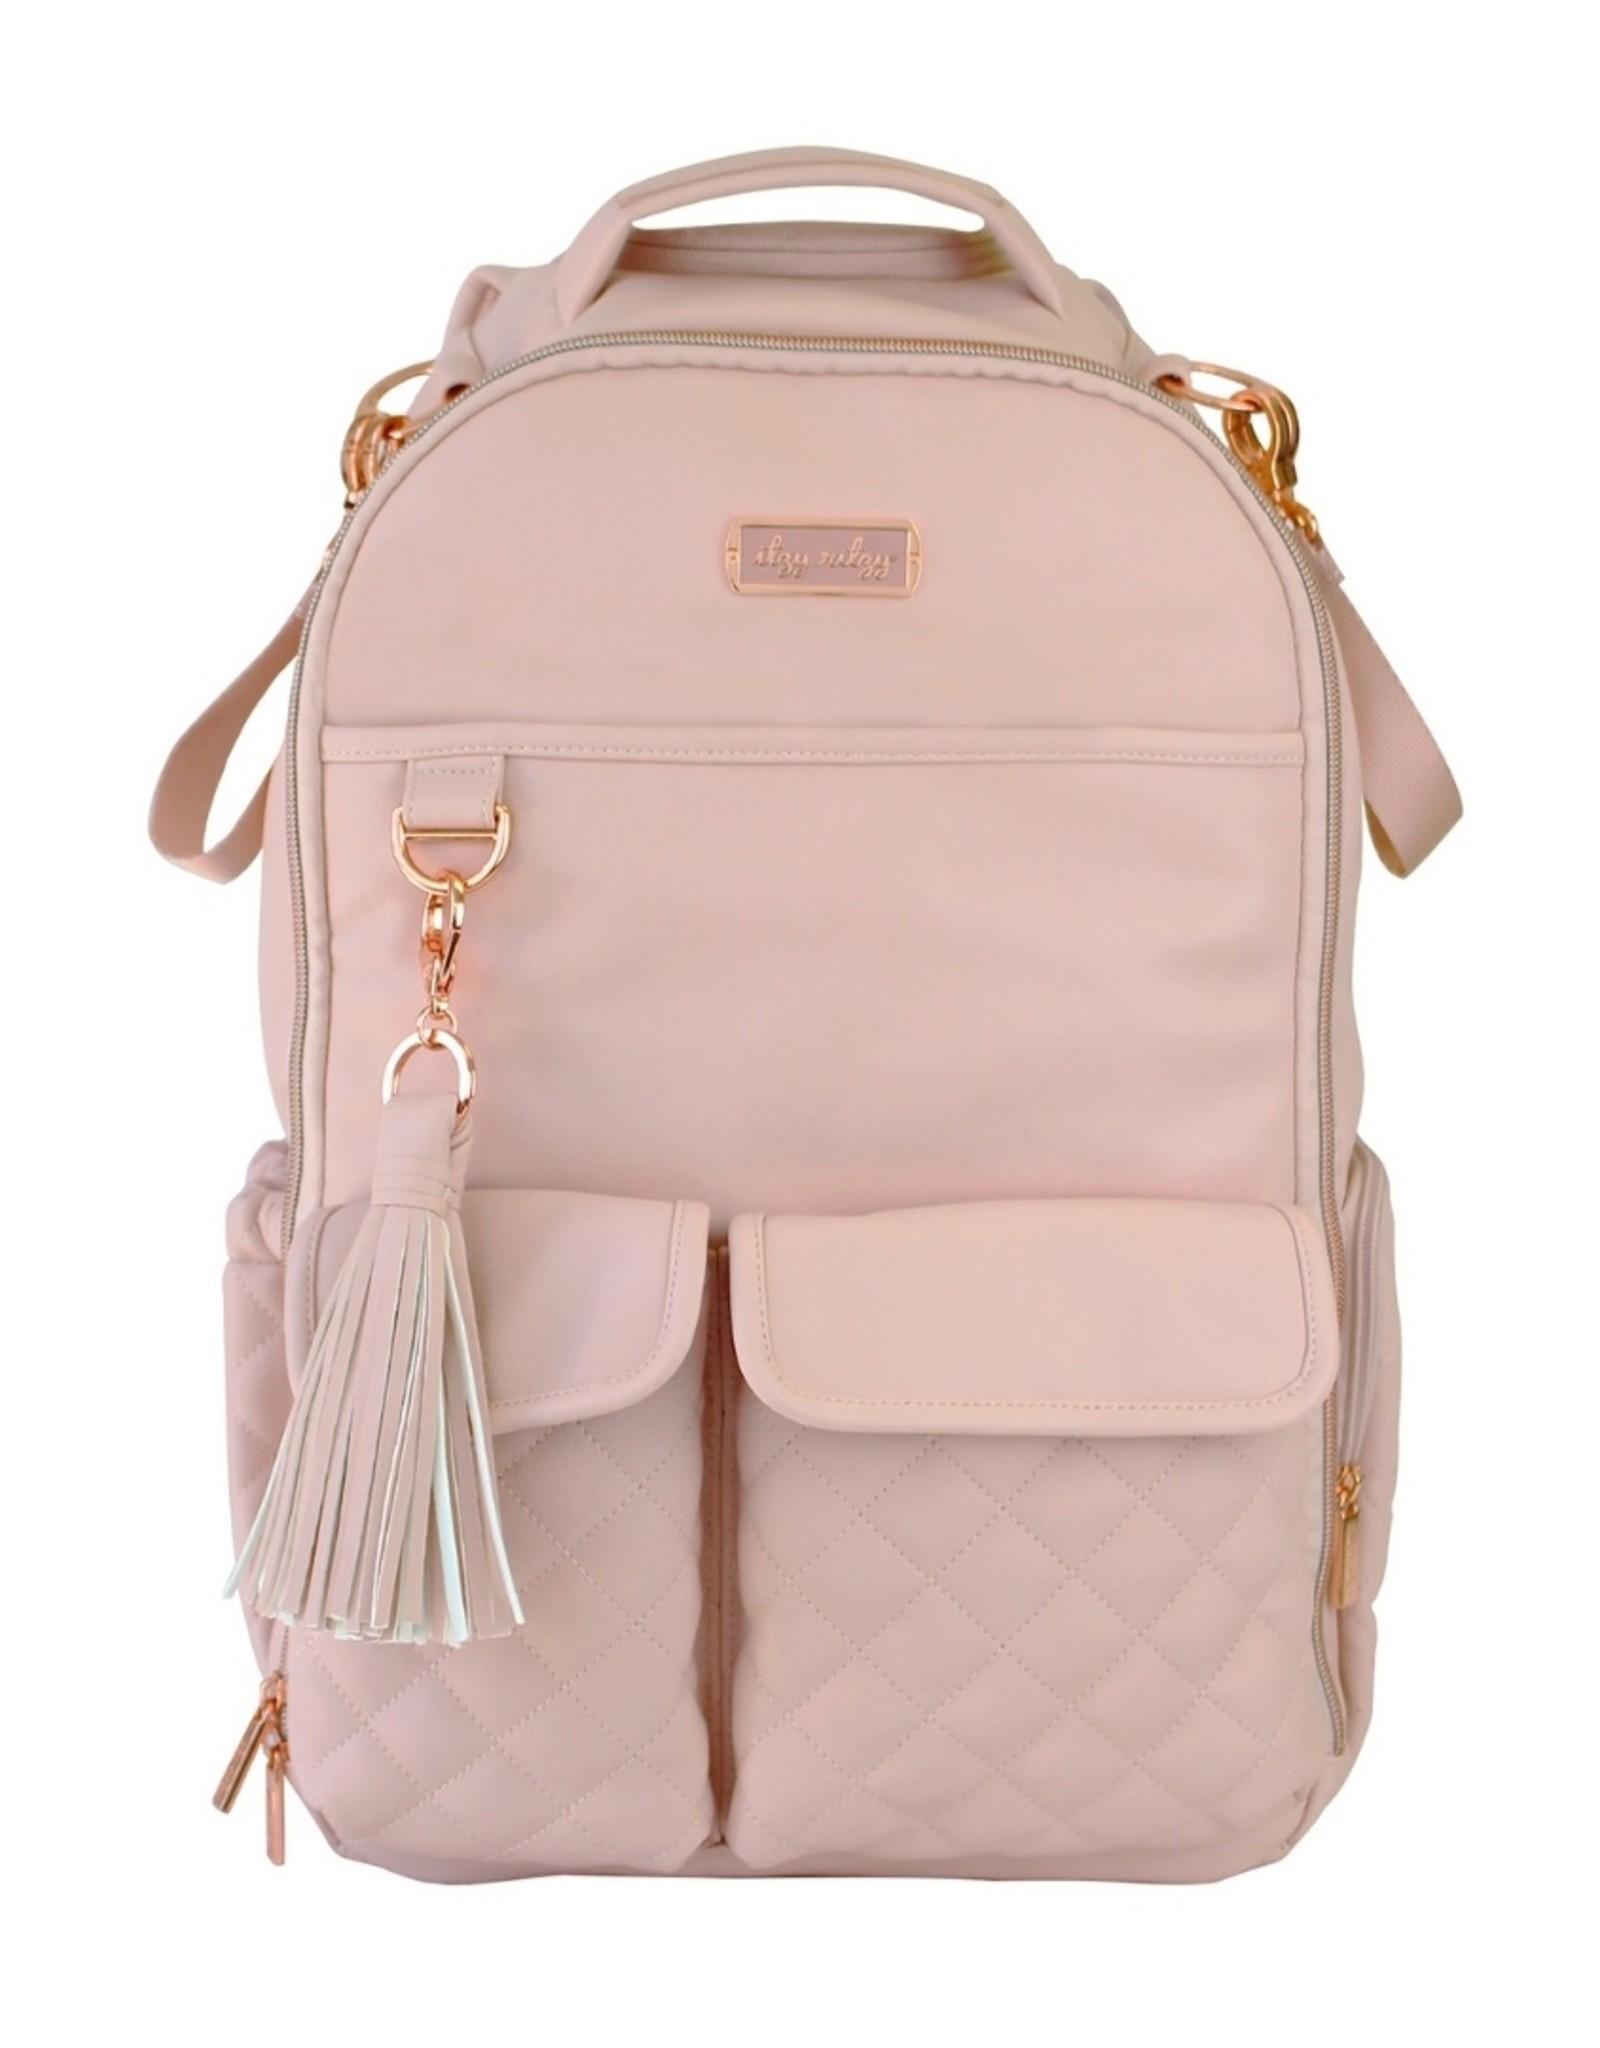 Itzy Ritzy Blush Crush Boss Backpack Diaper Bag